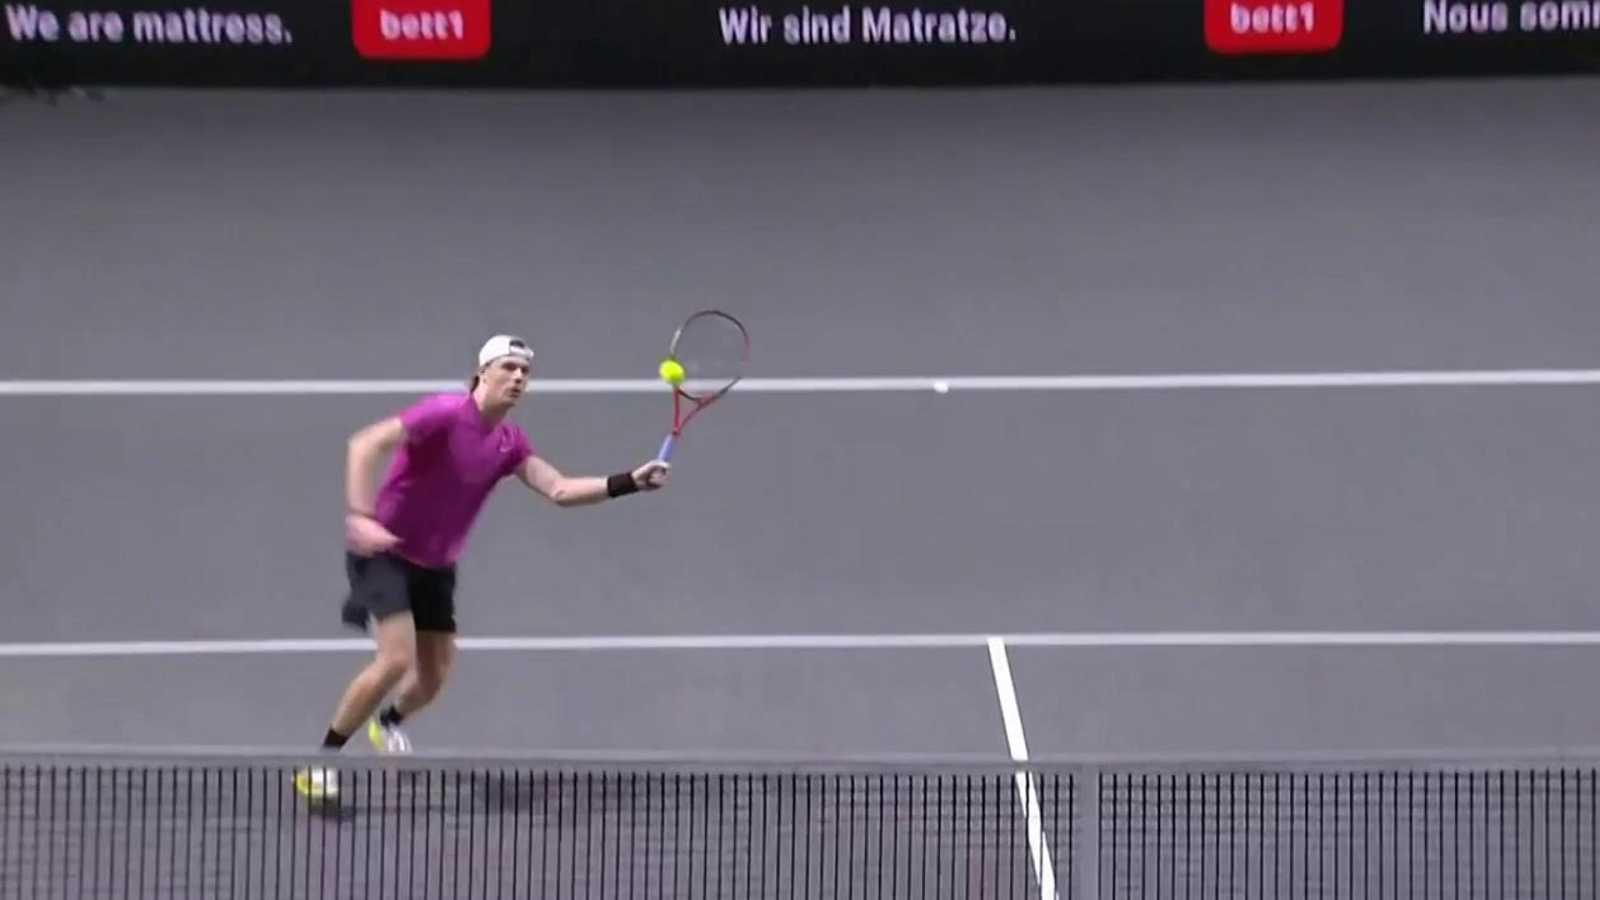 Tenis - ATP 250 Torneo Colonia (II): Denis Shapovalov - Gilles Simon - ver ahora